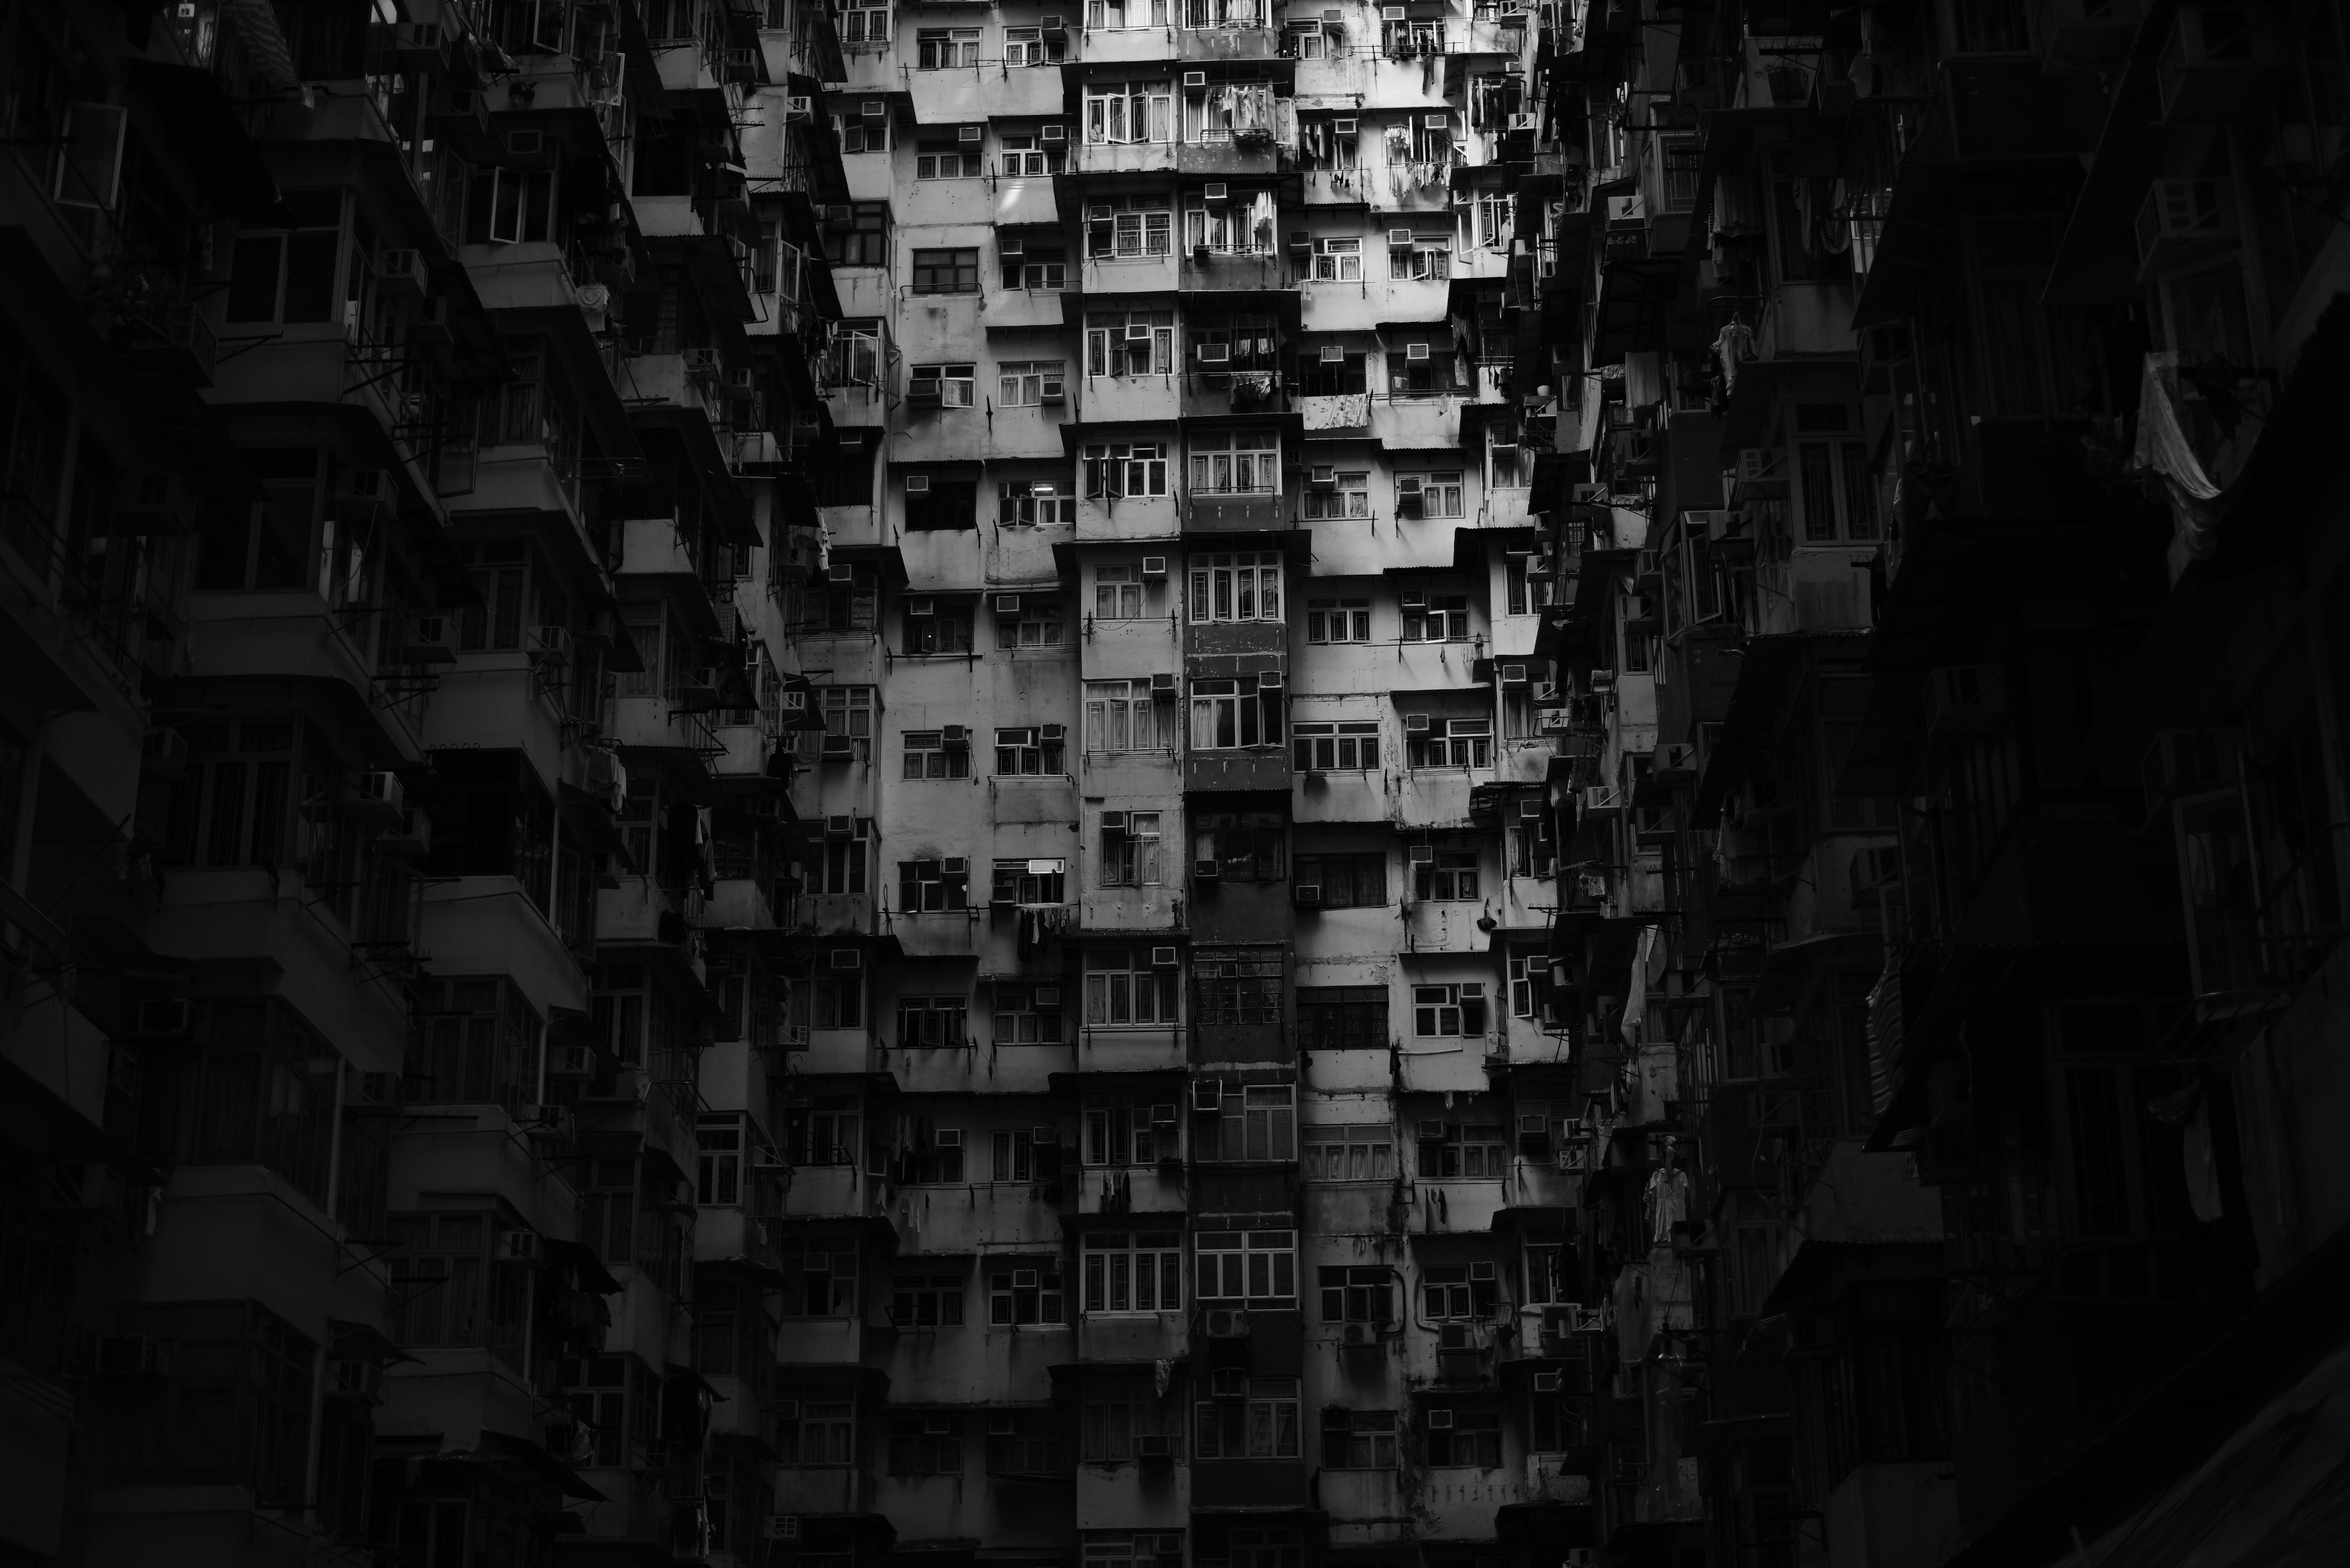 Spiral sad stories